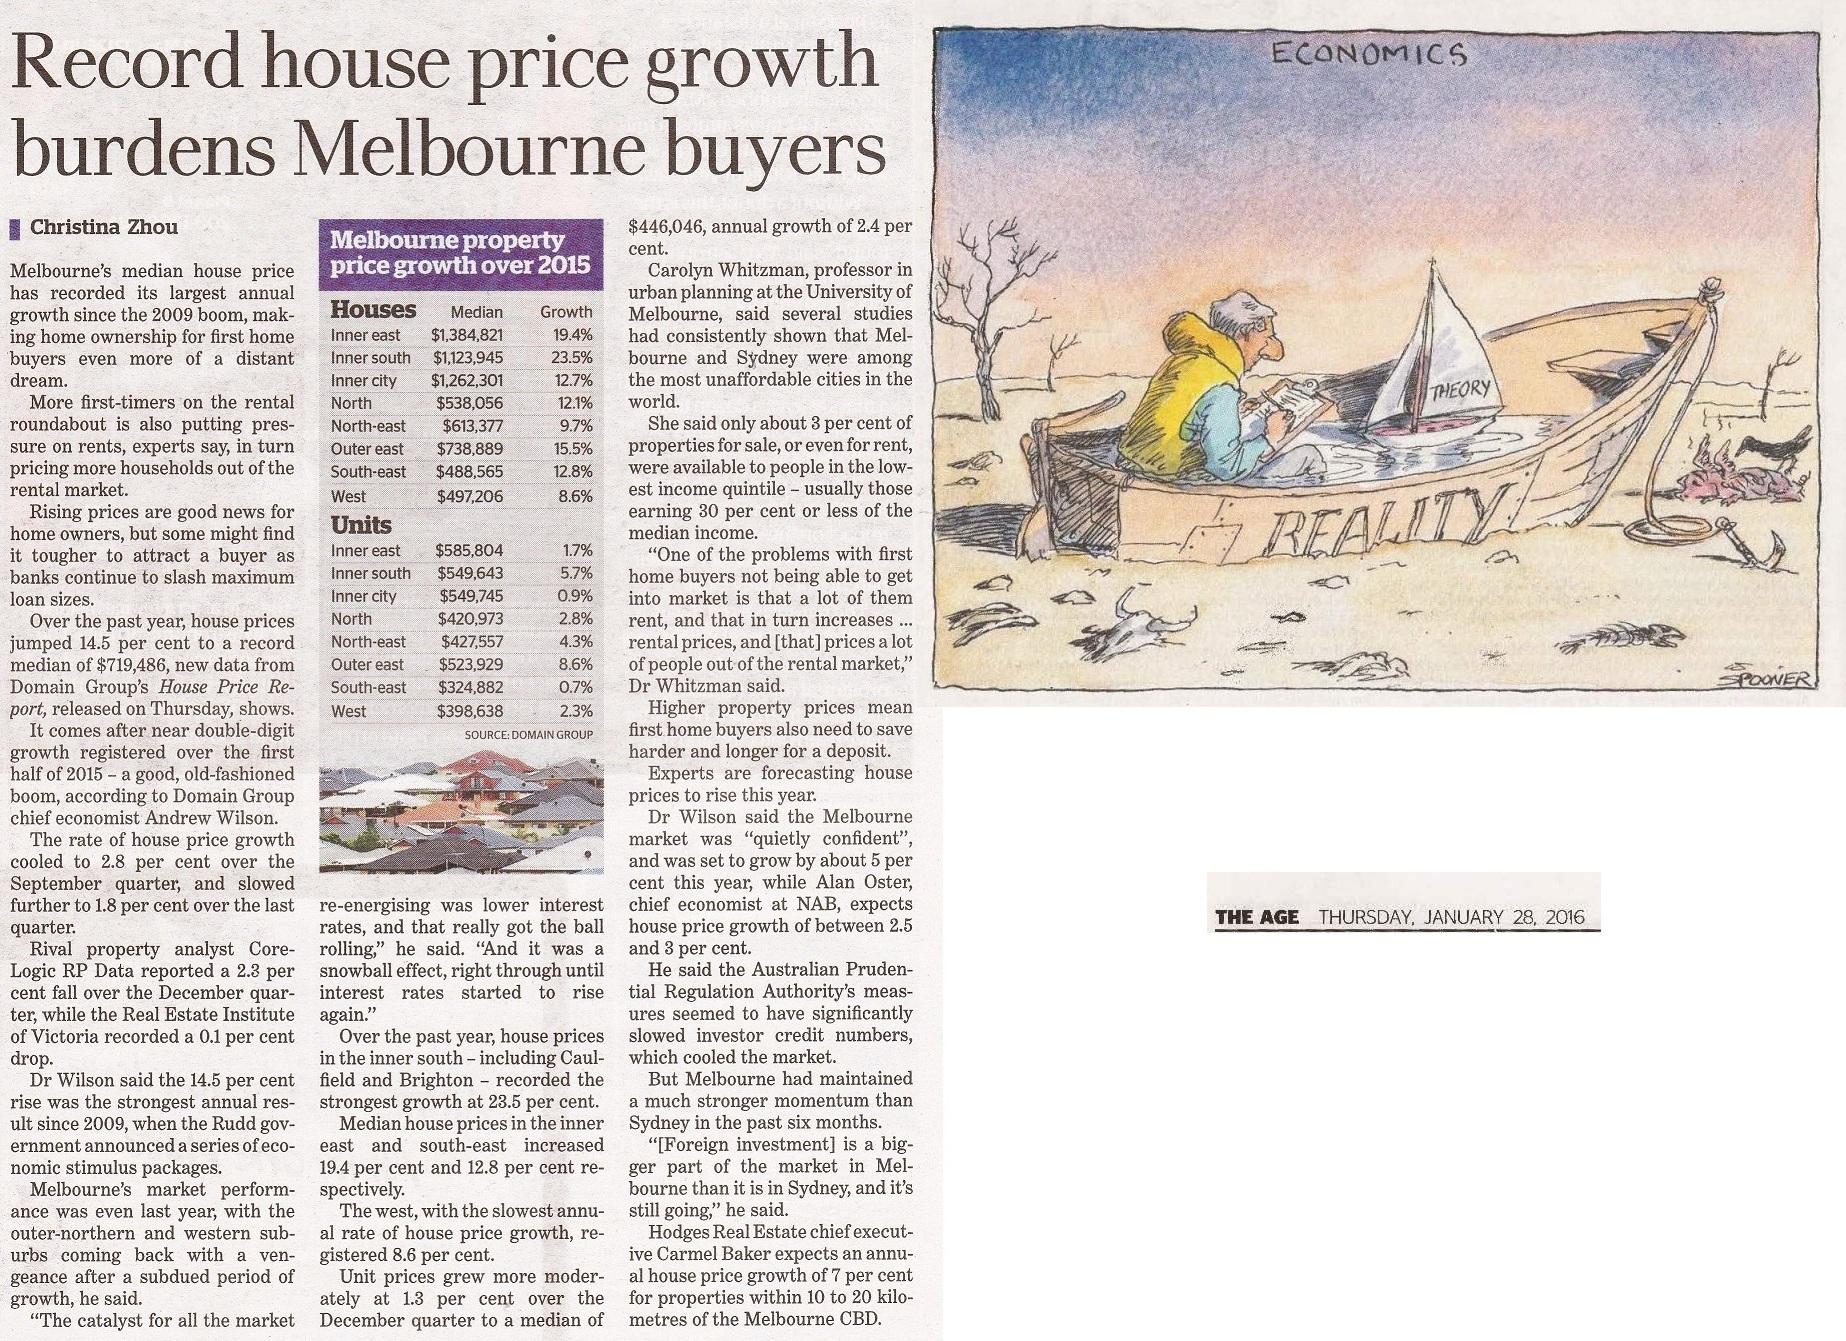 high property price affecting rental market